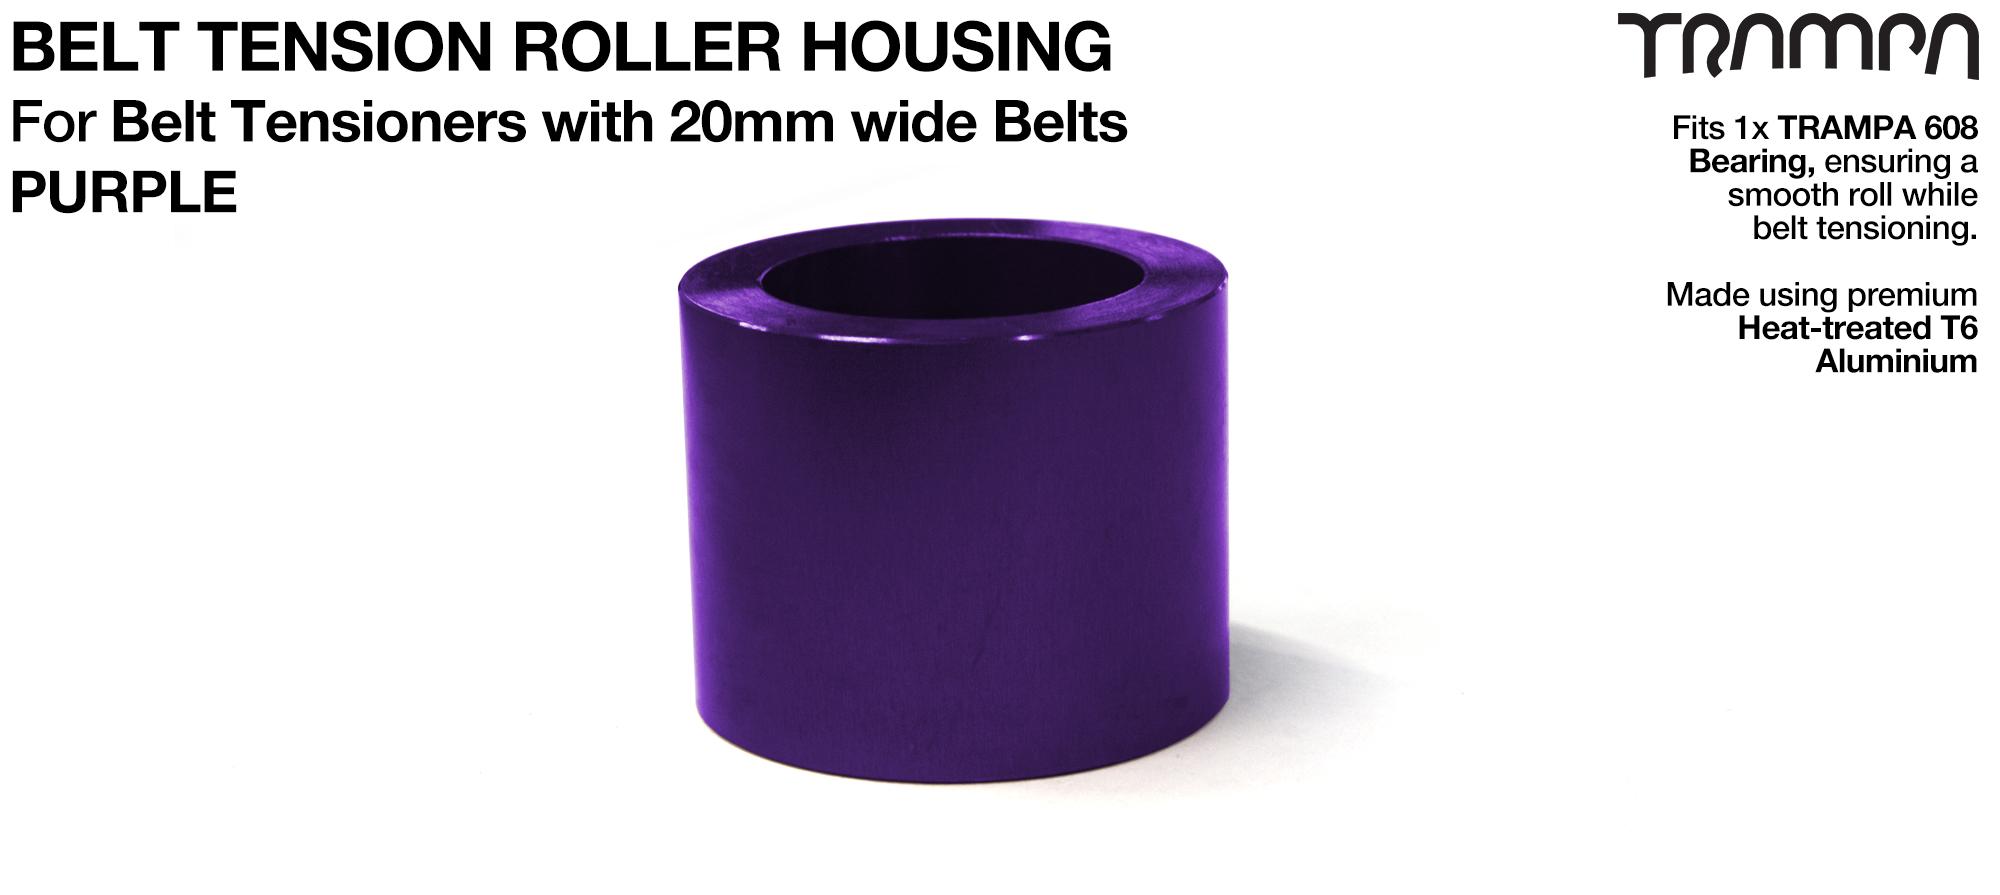 Belt Tension Roller Housing for 20mm Belts - PURPLE